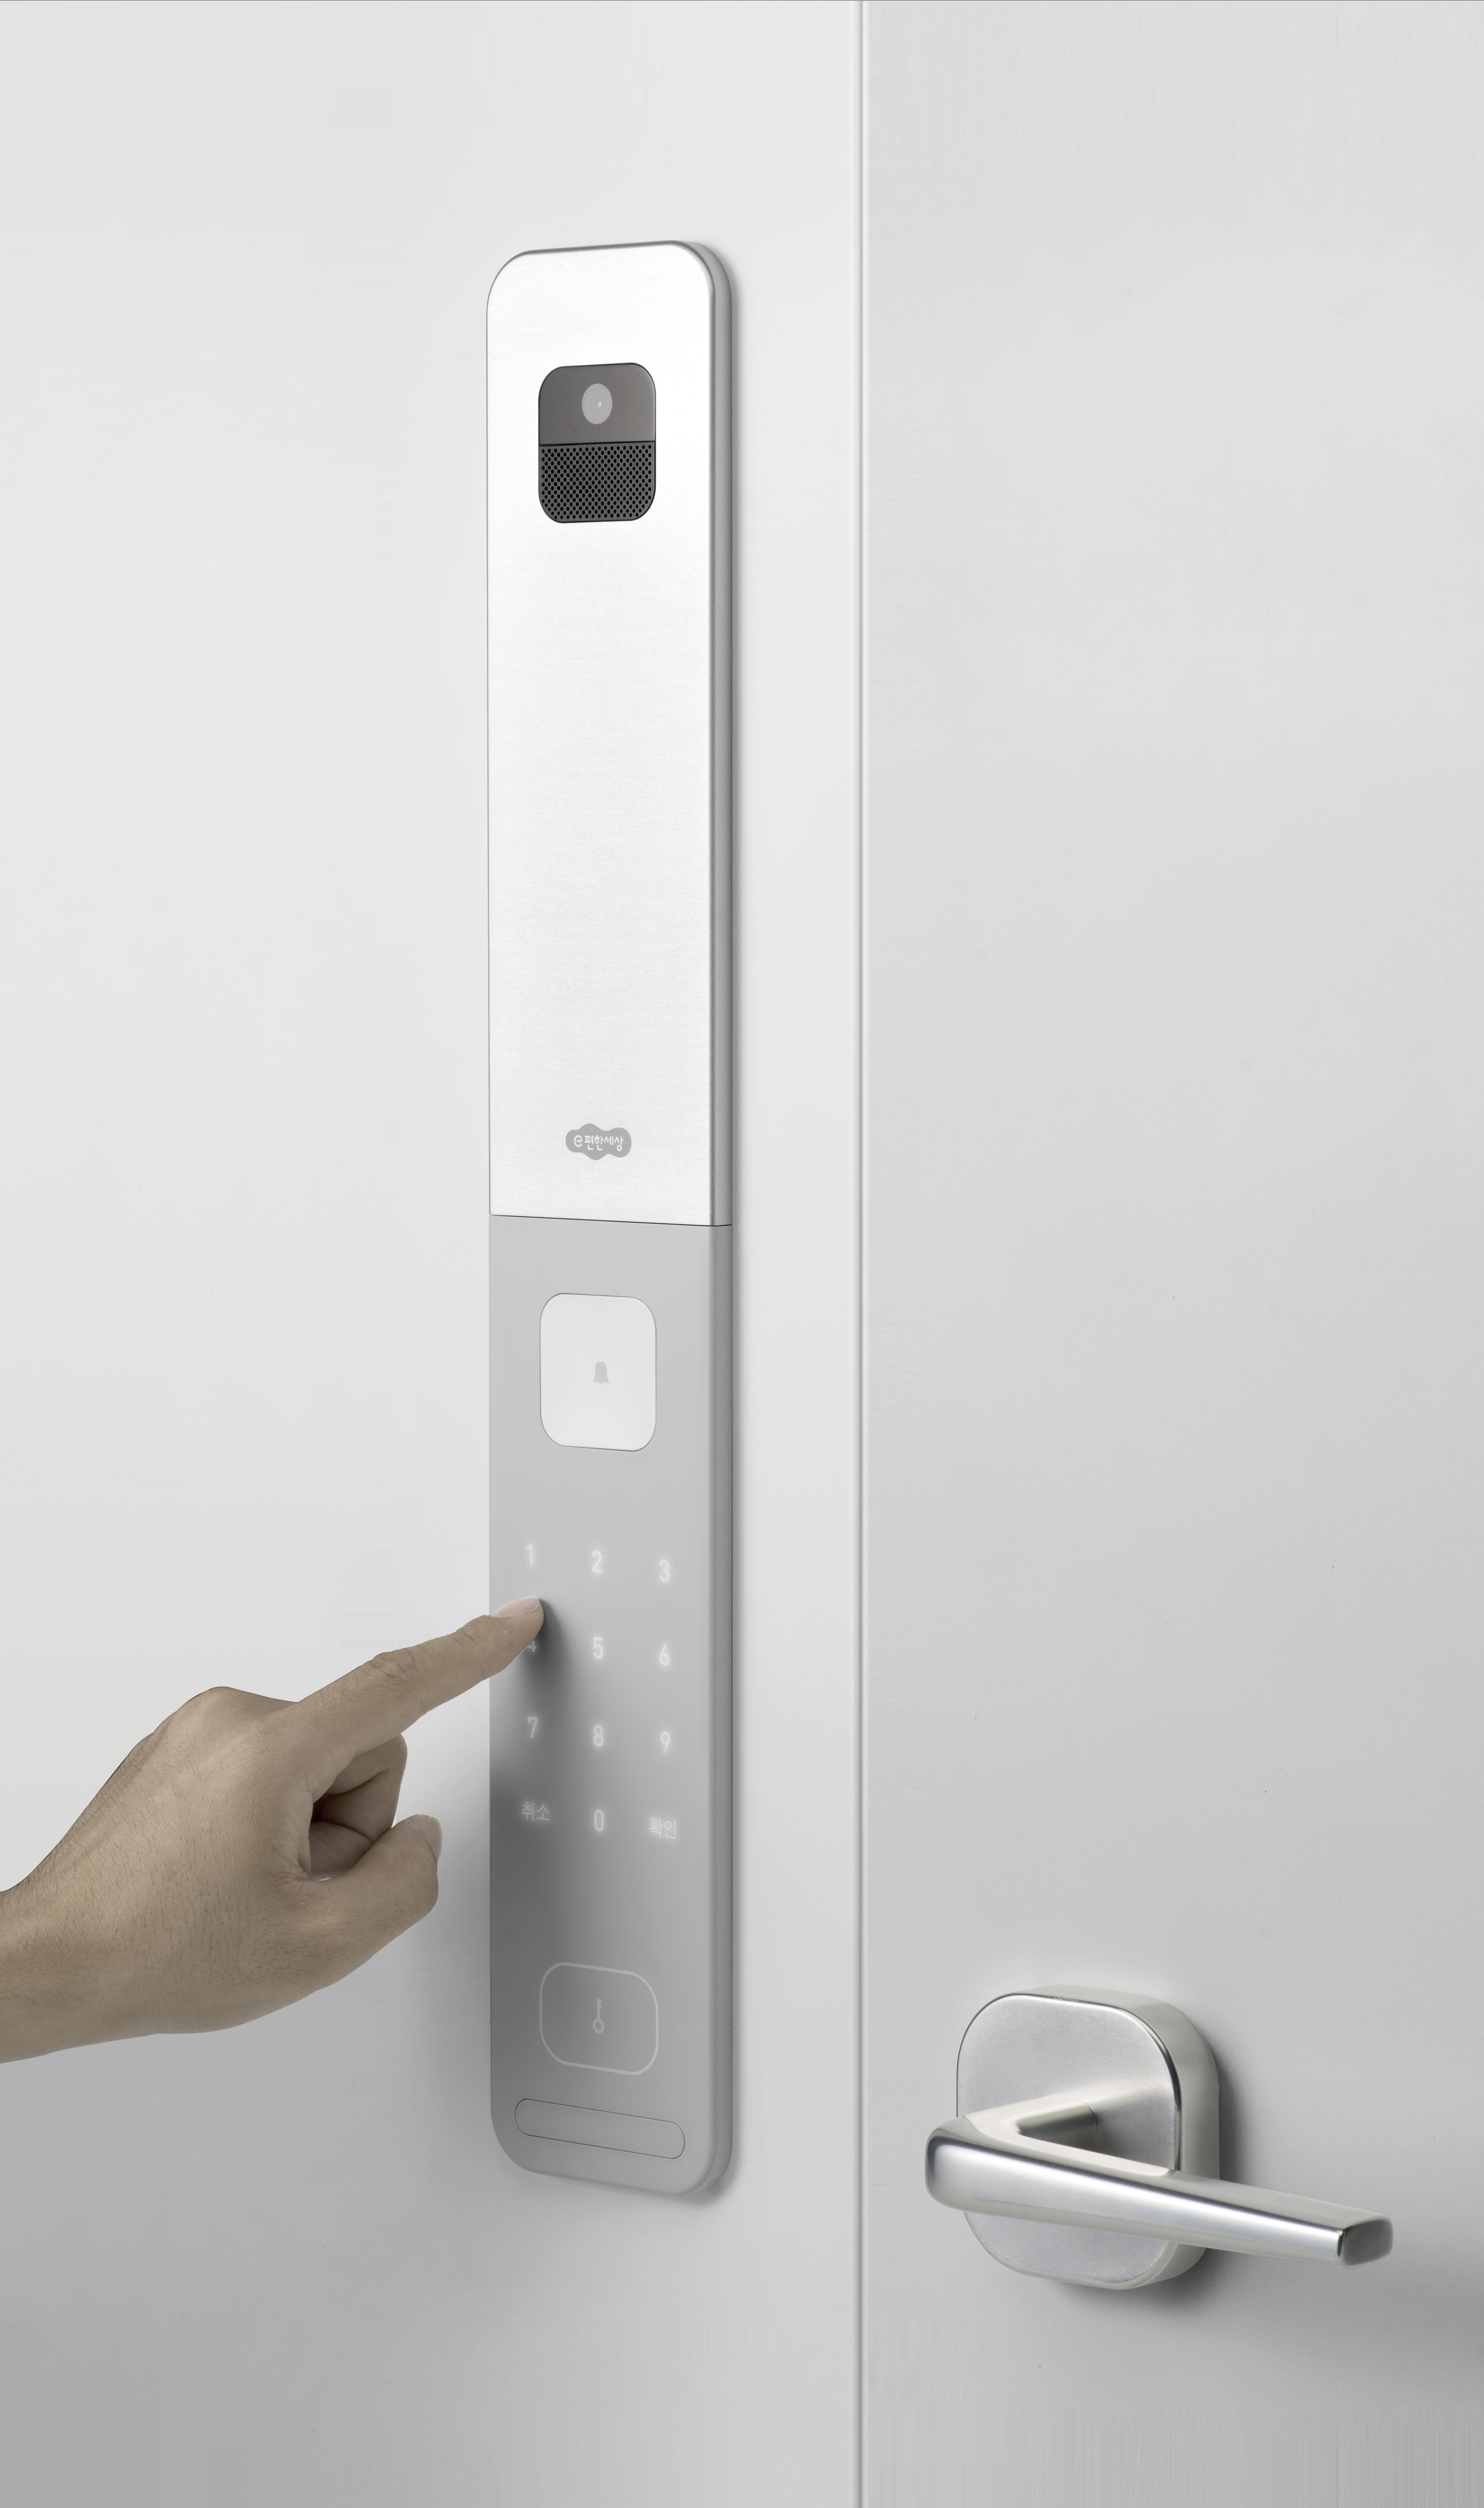 Sony Dsc Smart Home Design Iot Design Sony Design